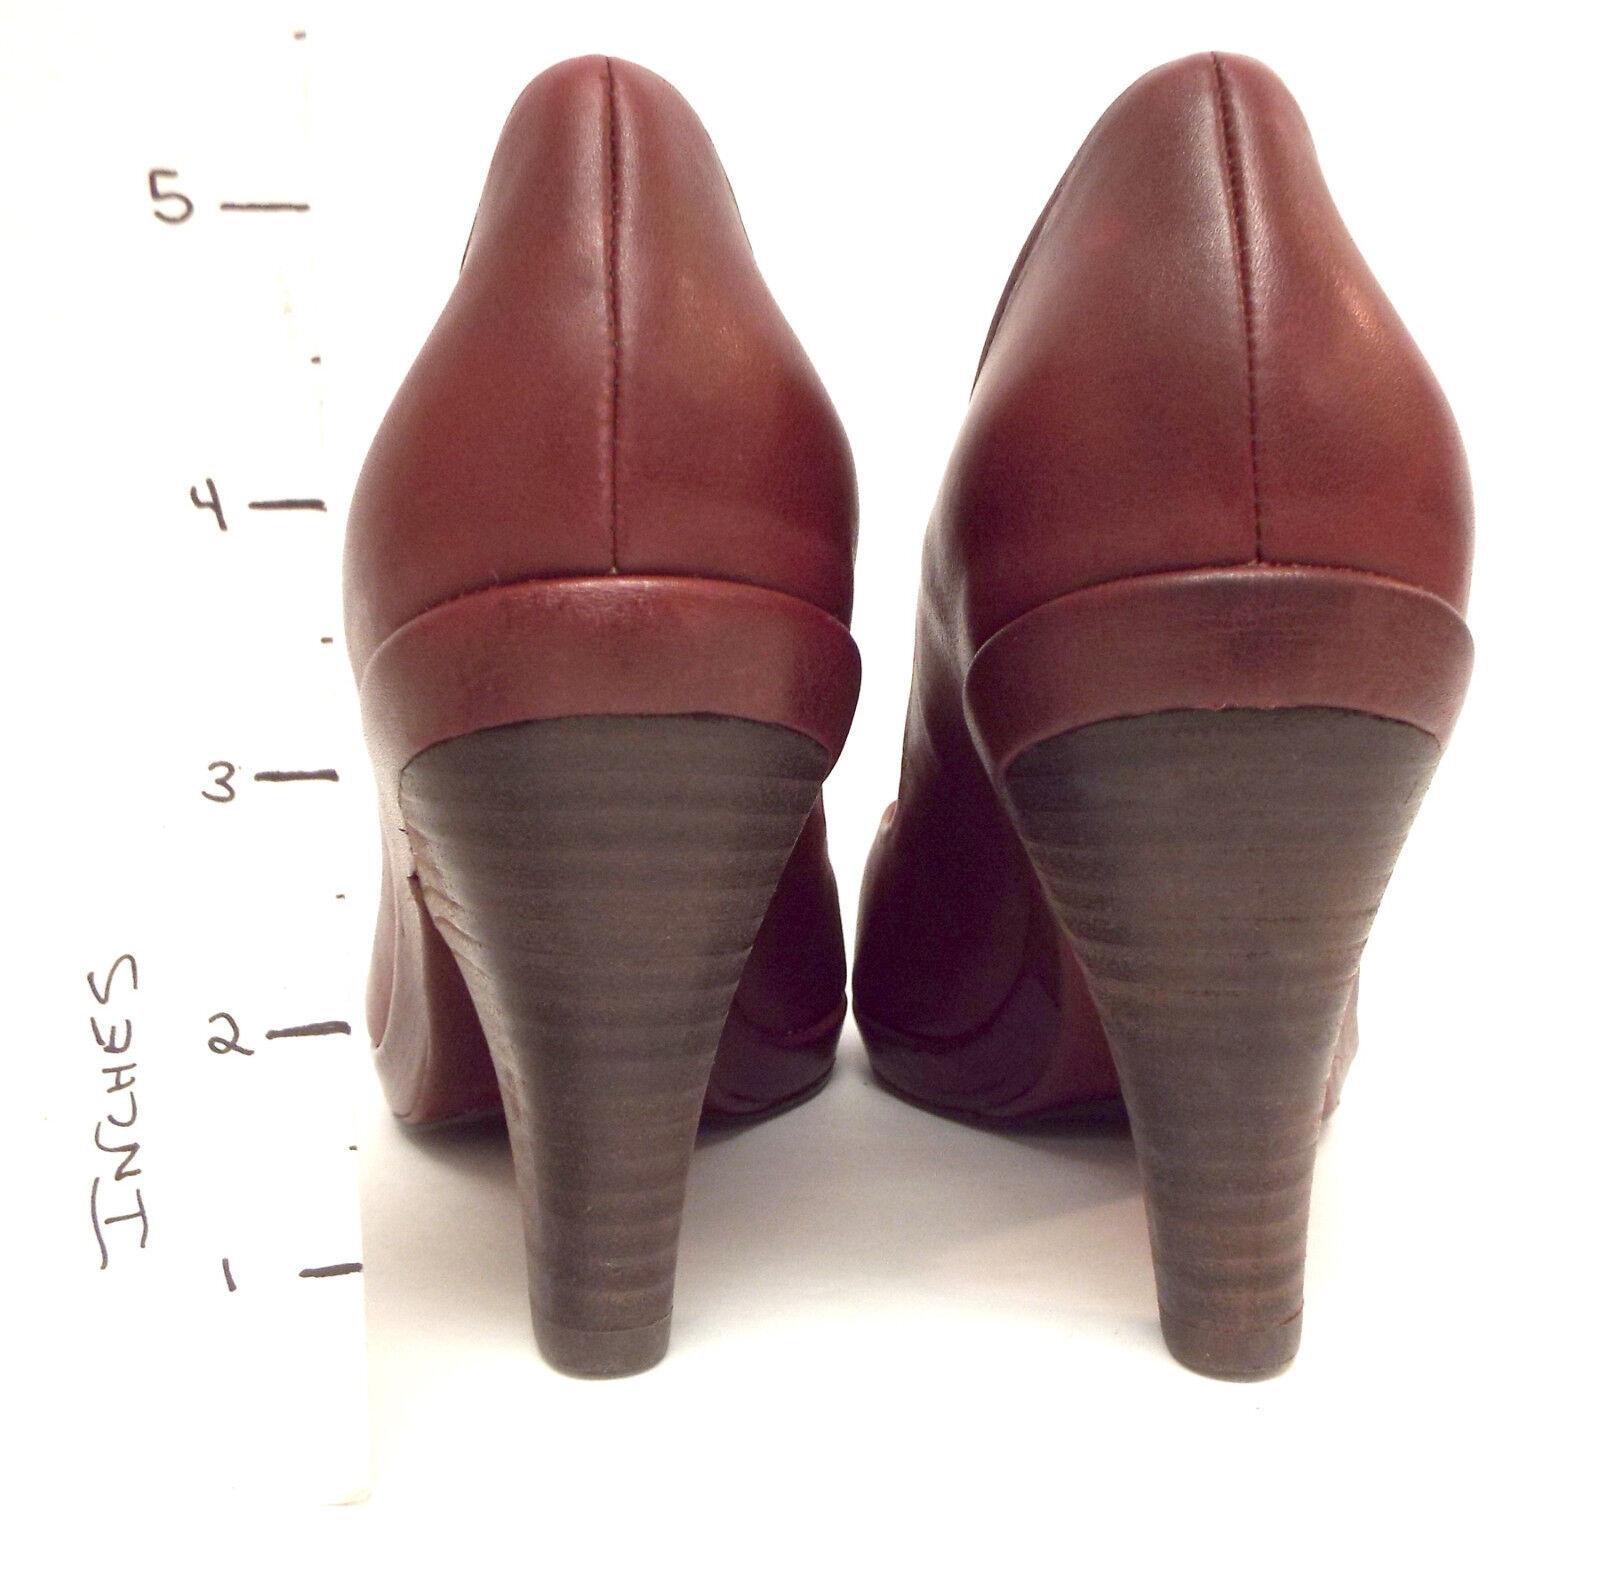 NEU COCLICO Größe 7.5 Dark ROT POLLY Peep Toe Heels Pumps Schuhes 38